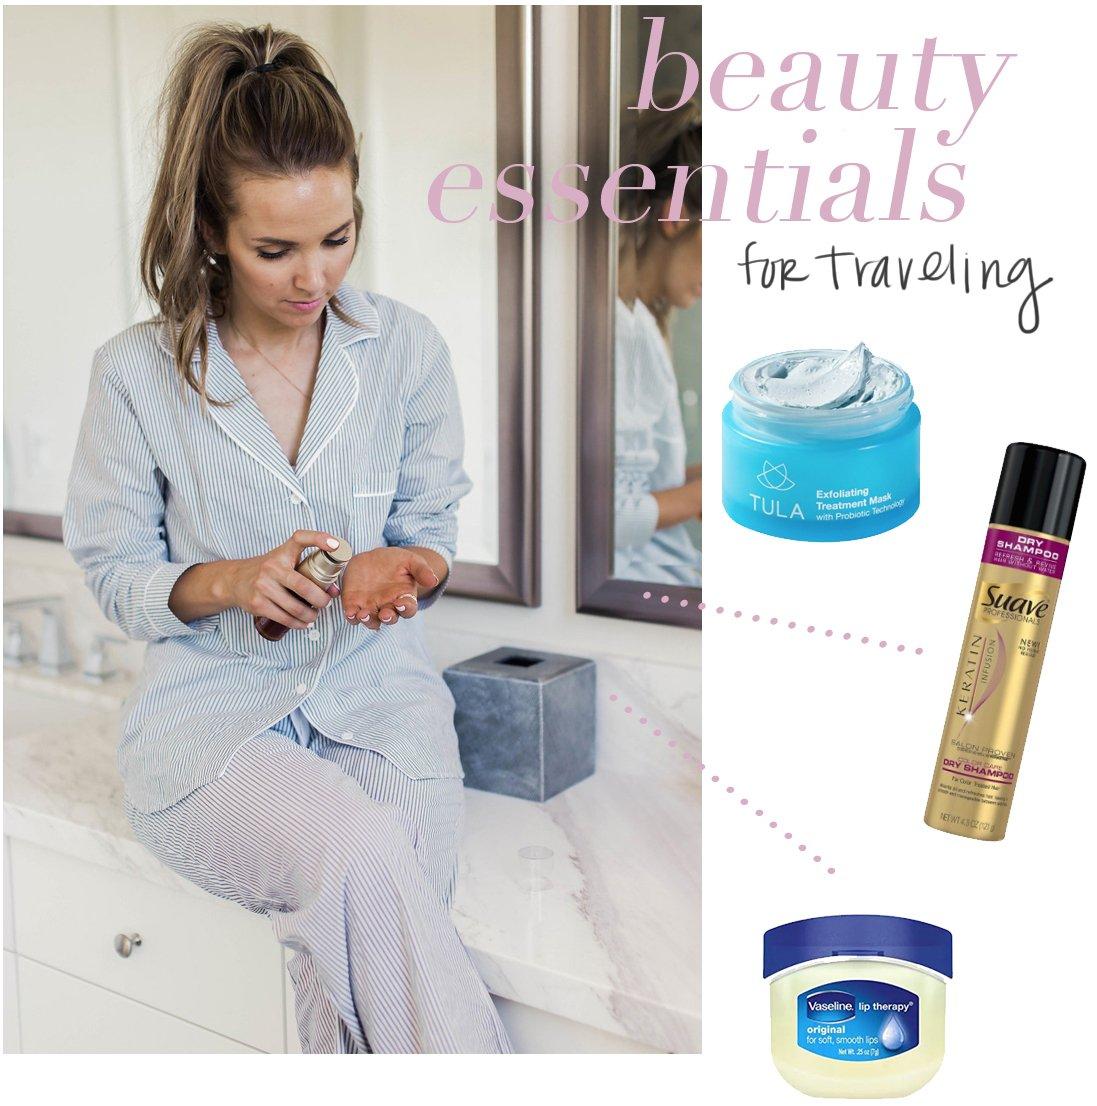 my five beauty essentials for traveling | merricksart.com